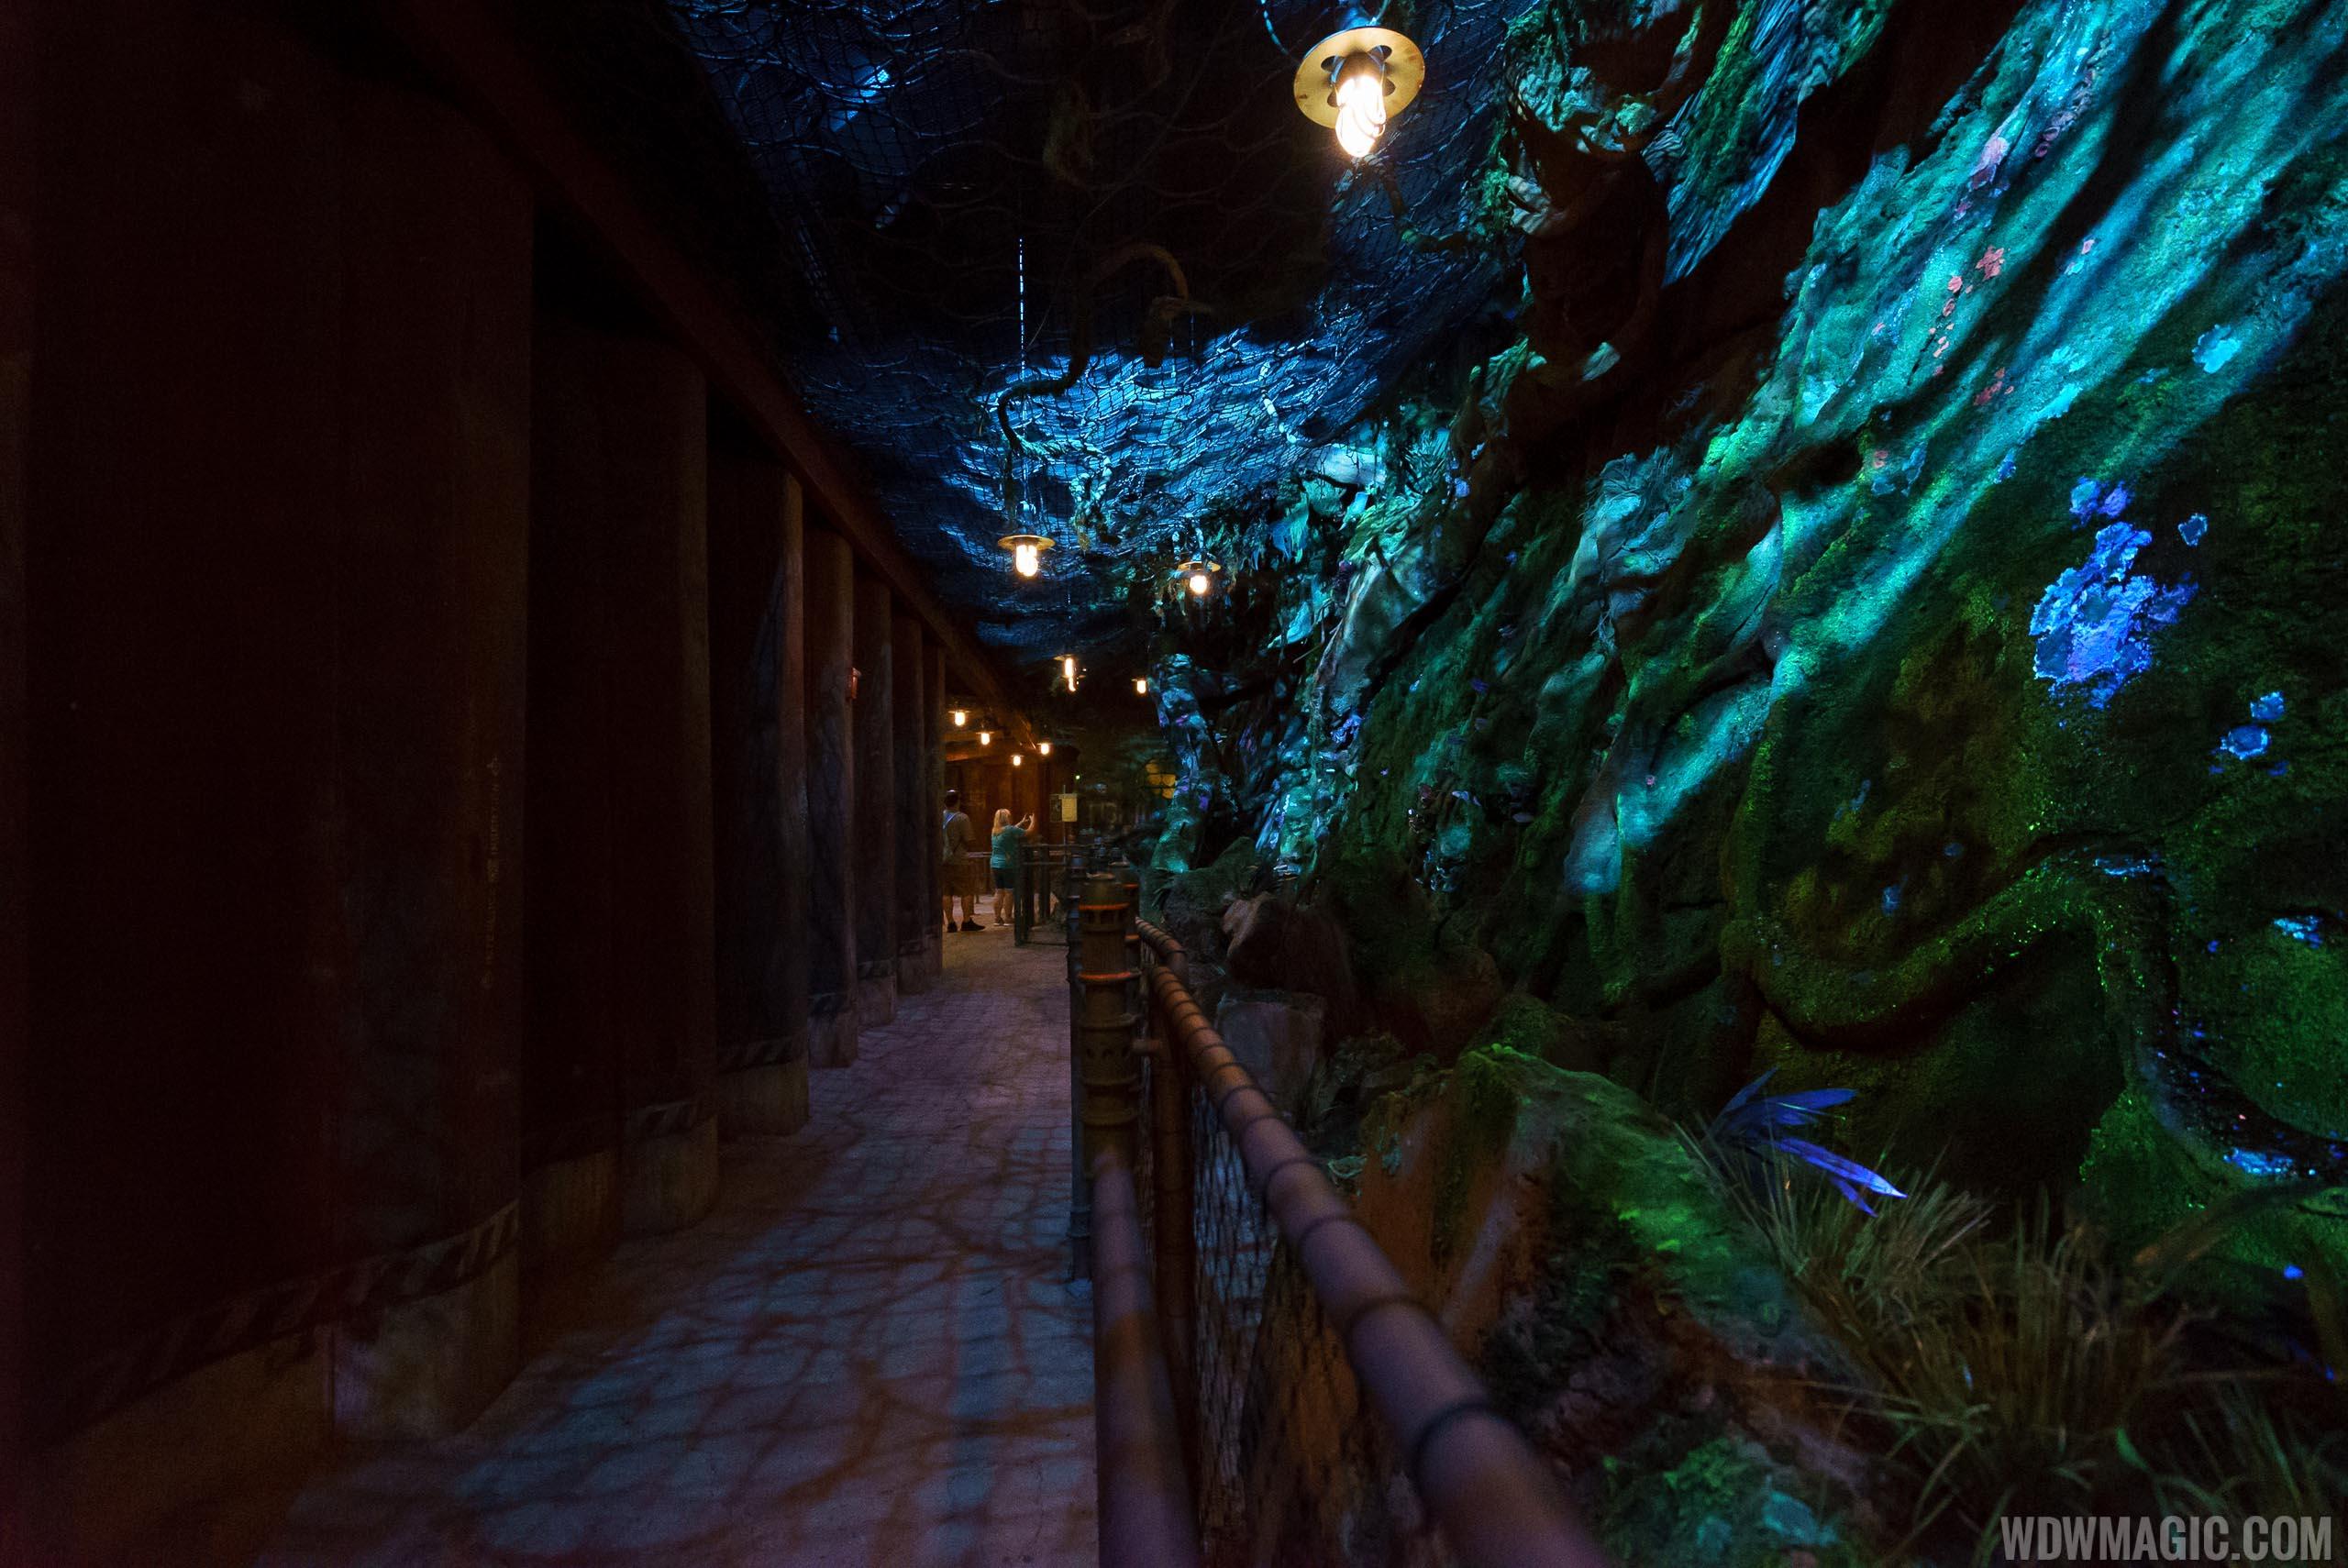 Avatar Flight of Passage queue - Bioluminescence rock work